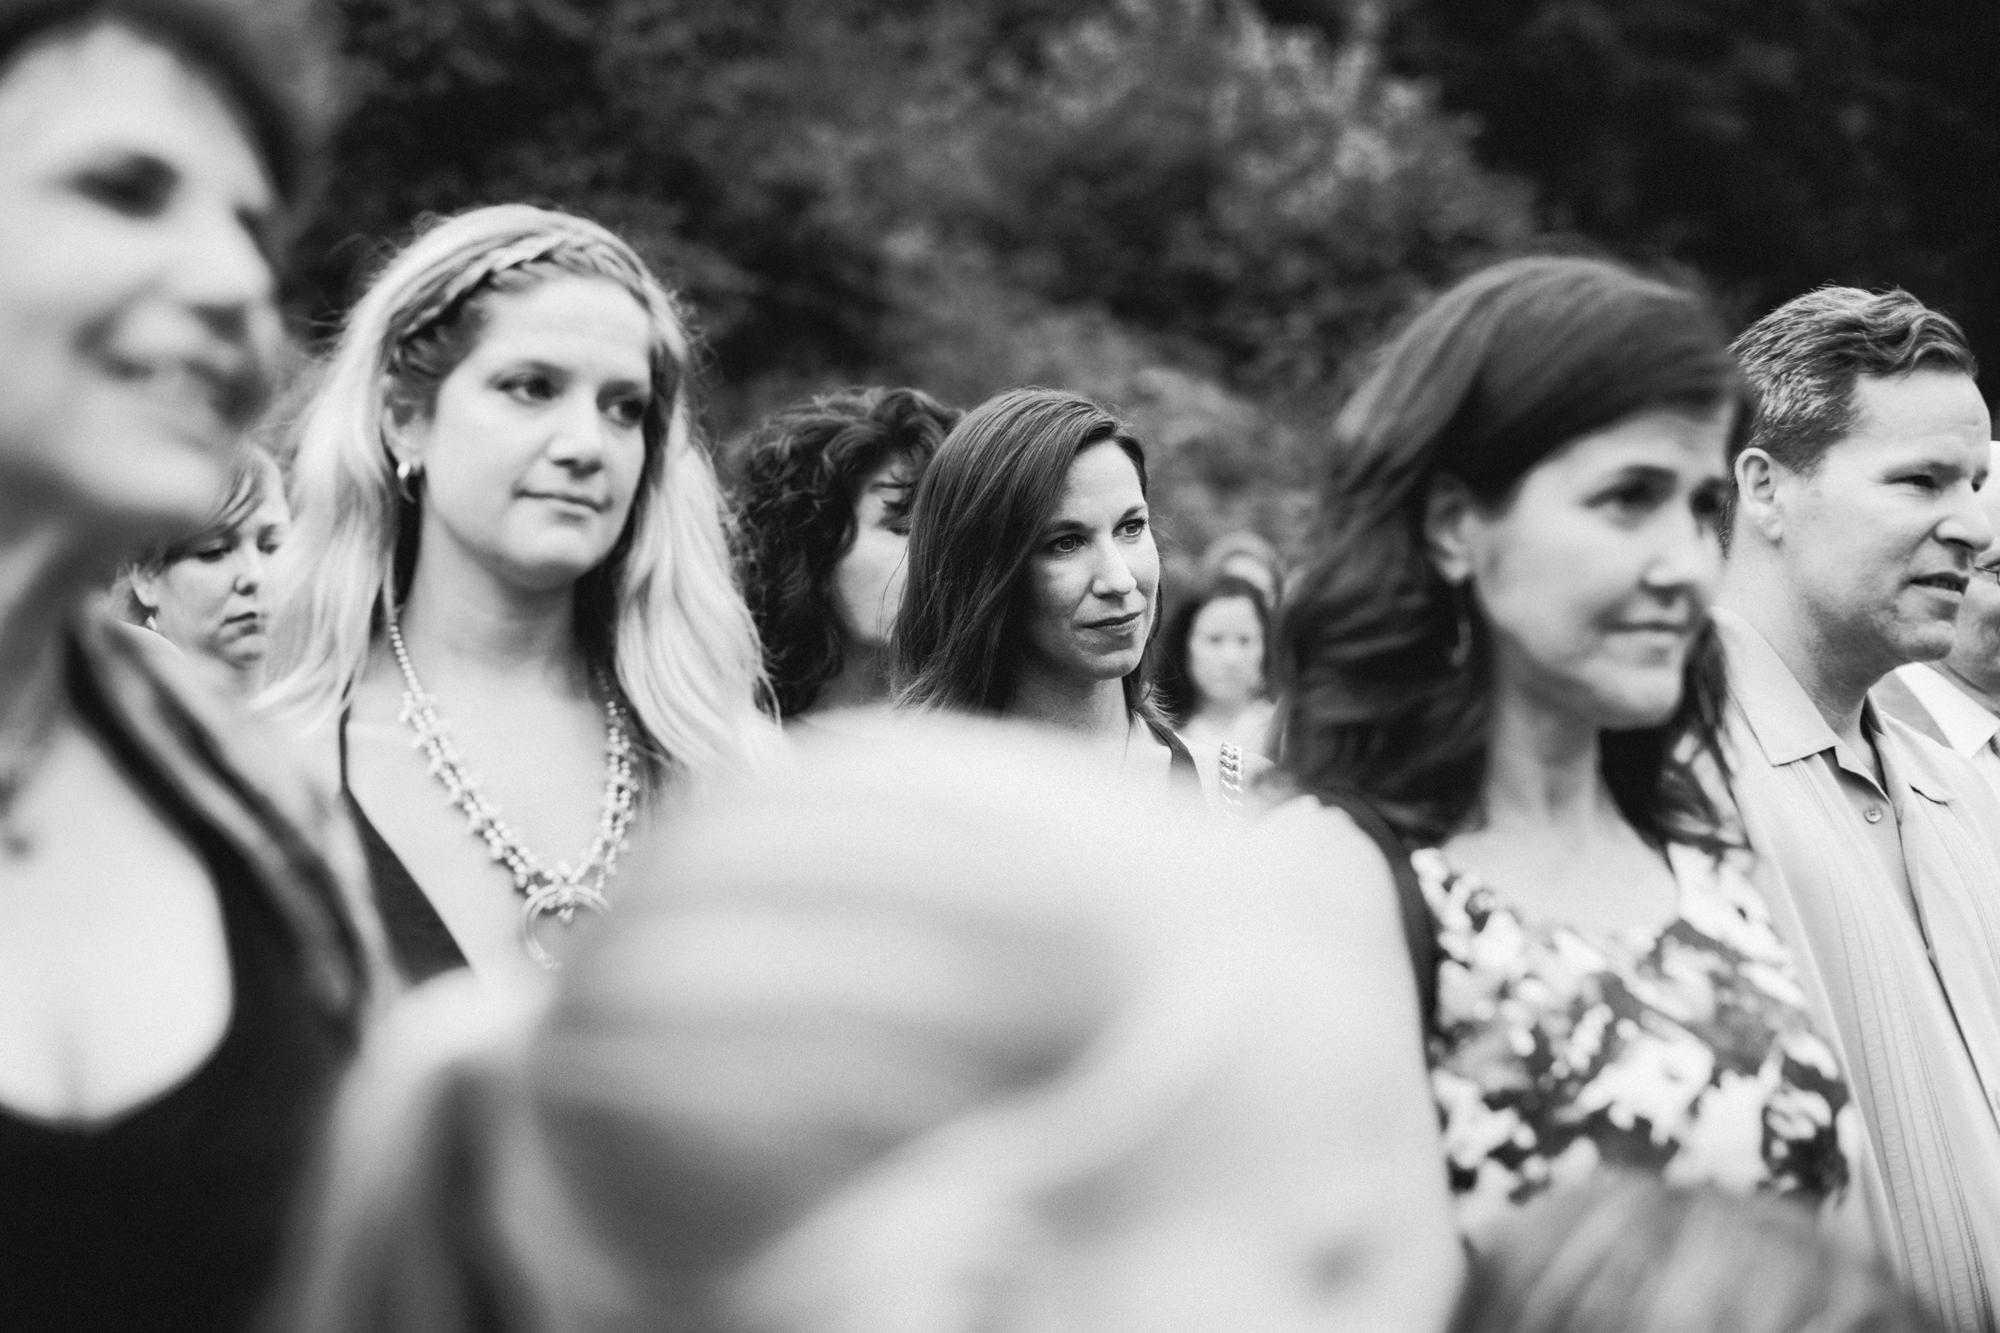 catskills_big_indian_springs_upstate_NY_wedding_sammblake058.jpg